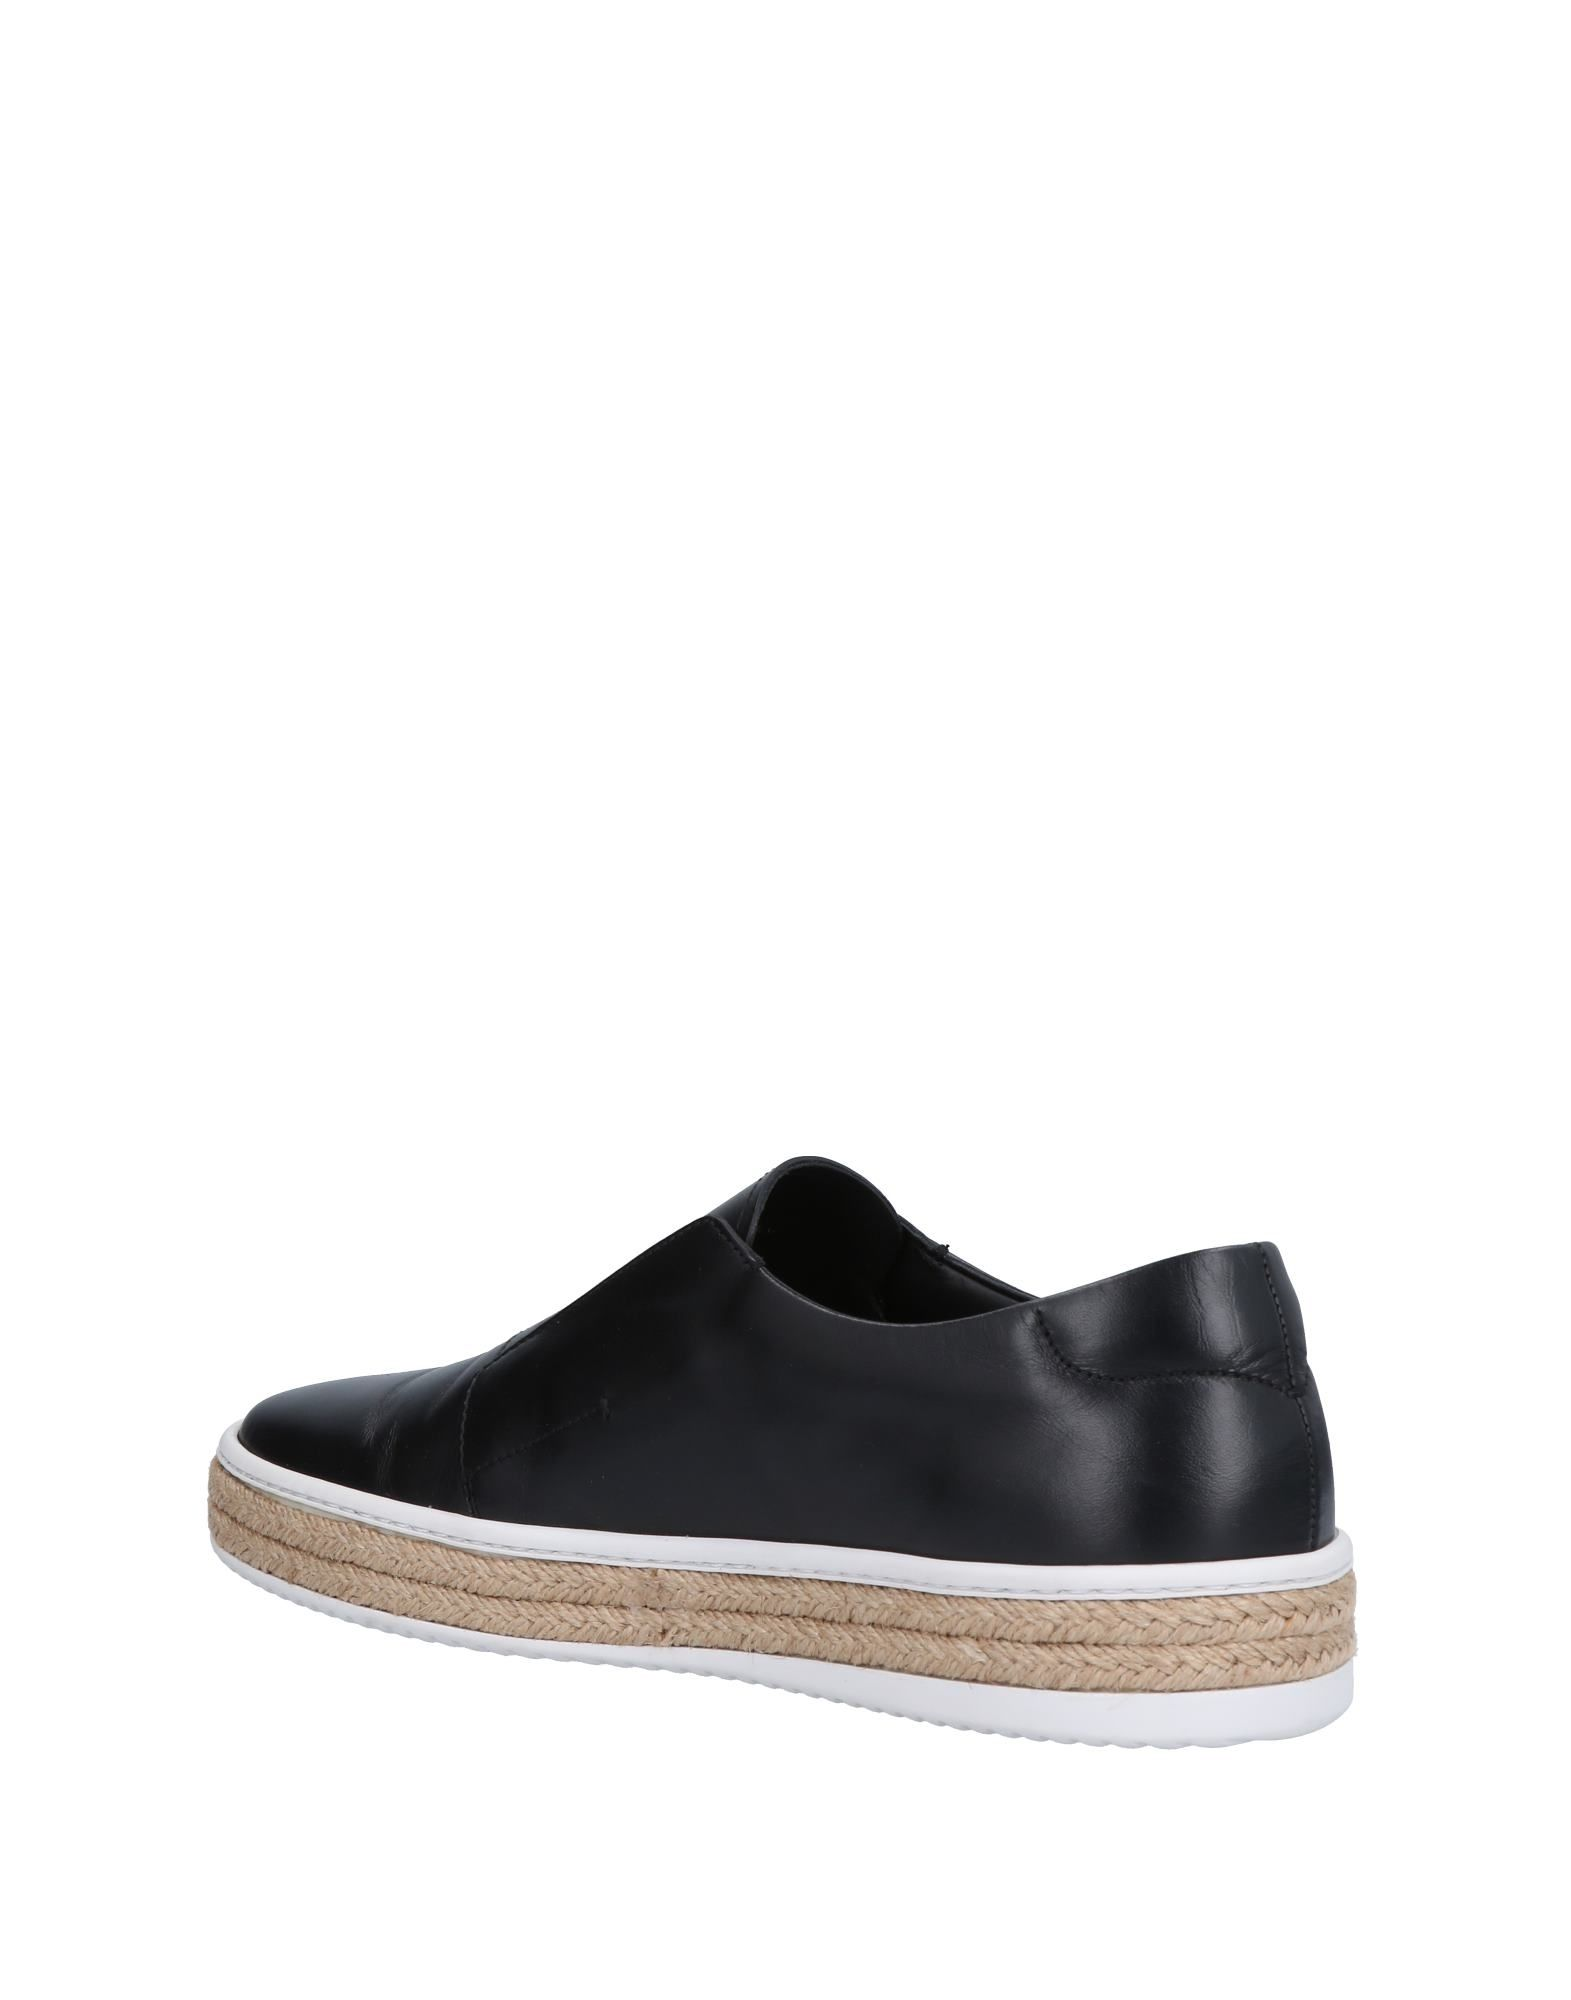 Prada 11492805AI Sport Sneakers Herren  11492805AI Prada Gute Qualität beliebte Schuhe d80994